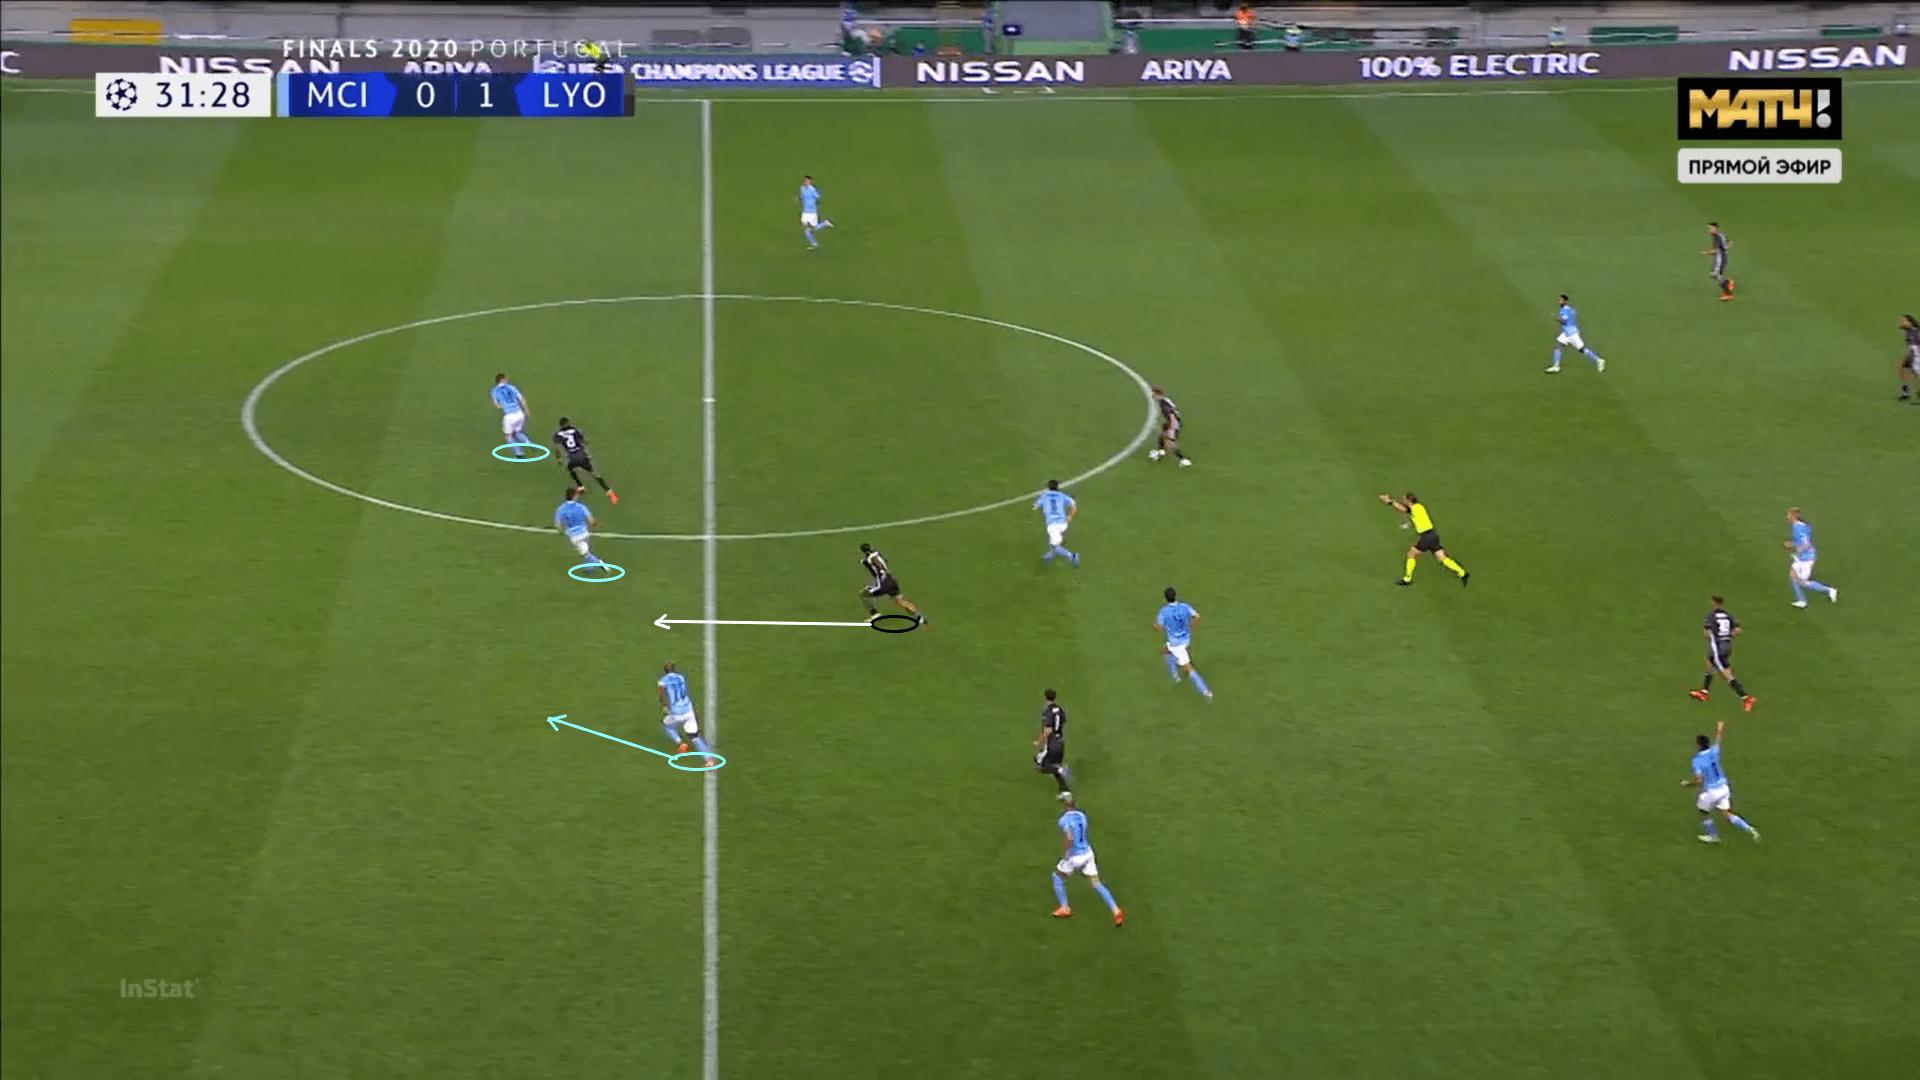 UEFA Champions League 2019/20: Manchester City vs Lyon - tactical analysis tactics